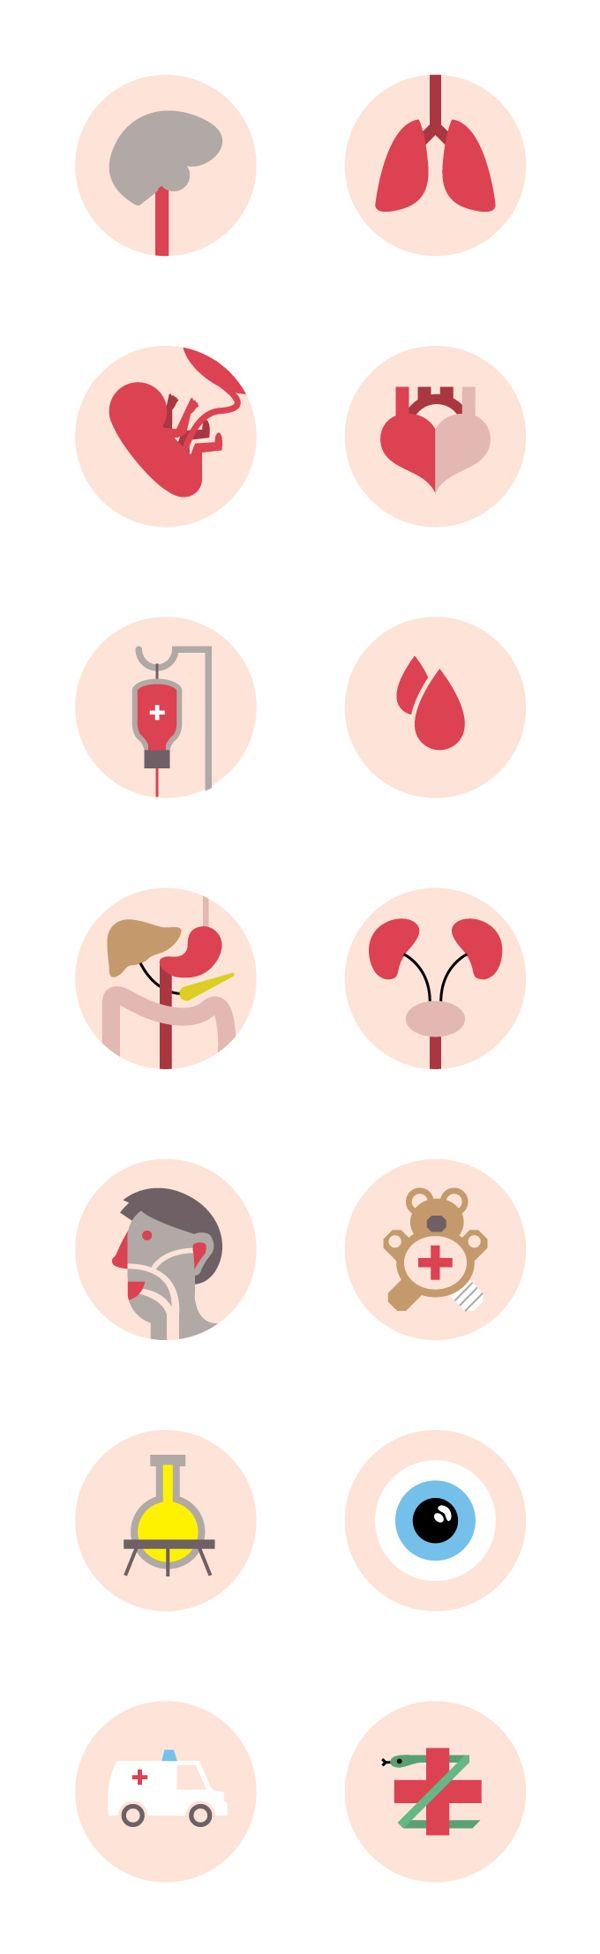 Medical Icon Set by Pieter Frank de Jong, via Behance